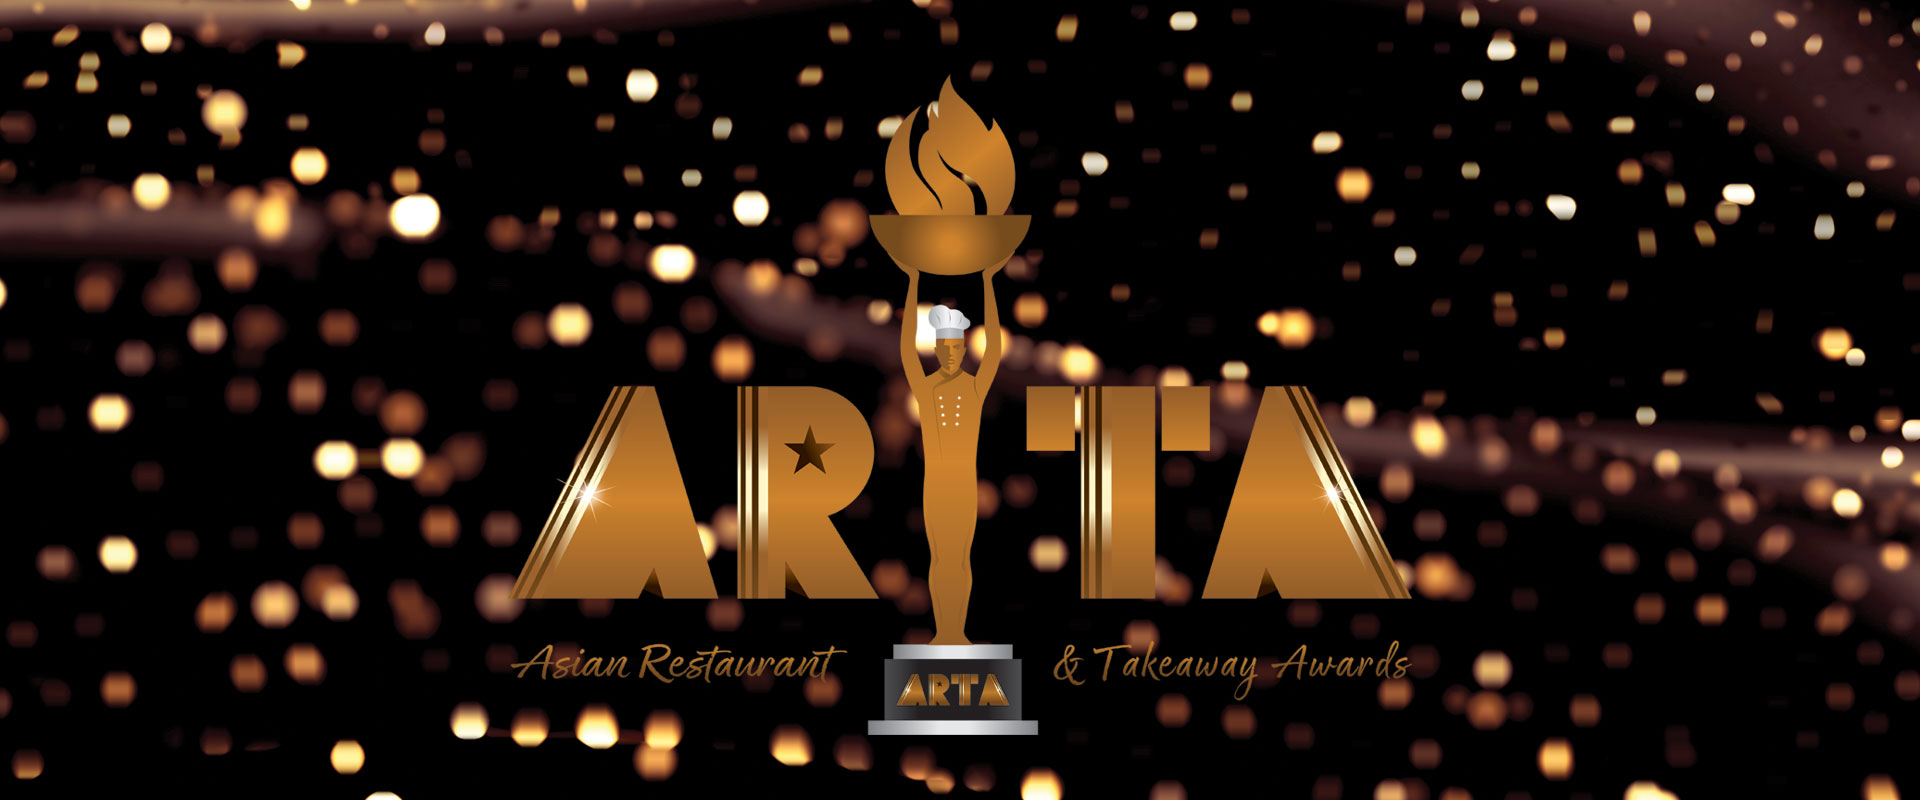 Asian Restaurant & Takeaway Awards (ARTA), London, United Kingdom